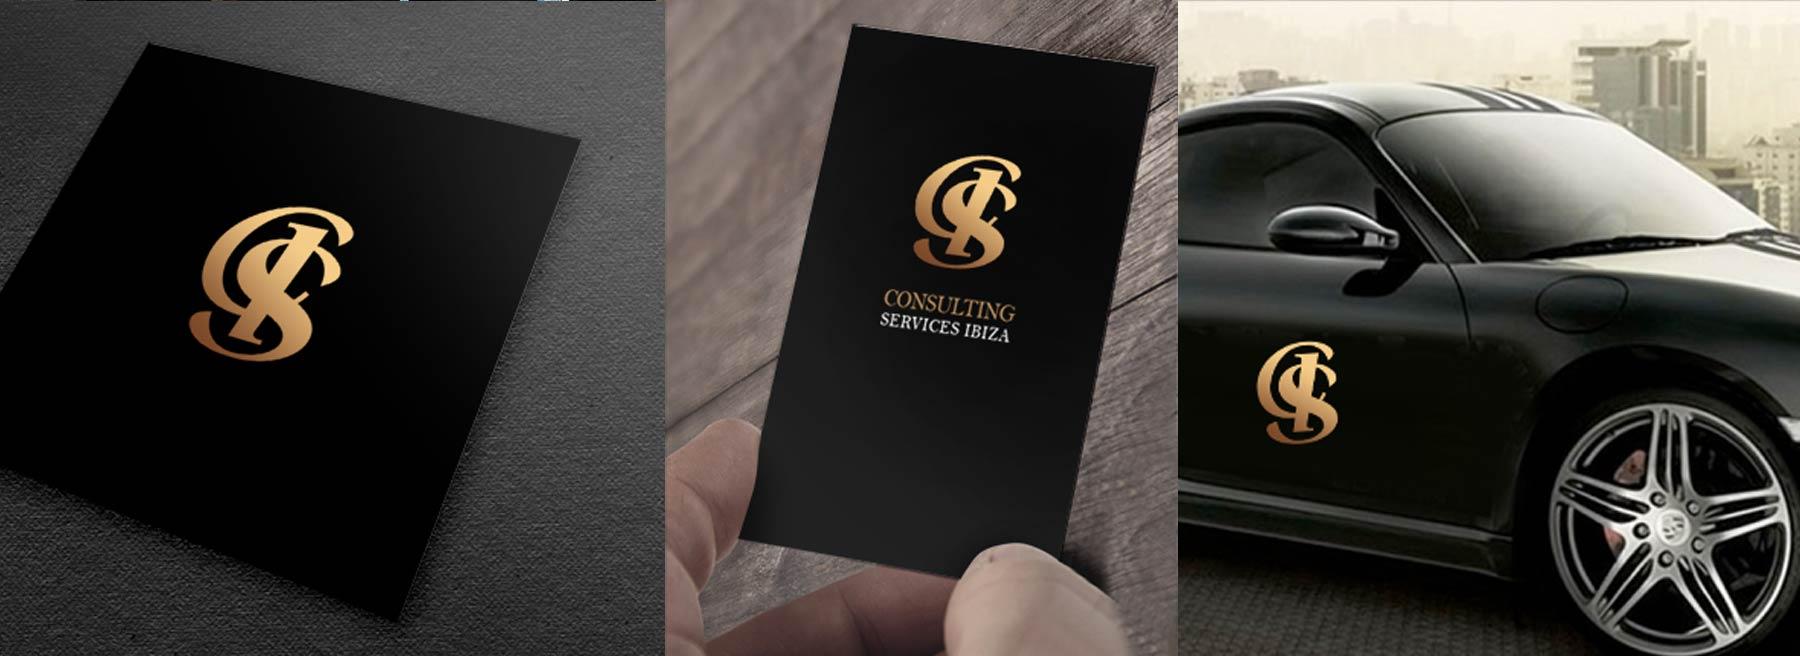 pixelimperium-ibiza-diseno-web-branding-marketing-slider_9